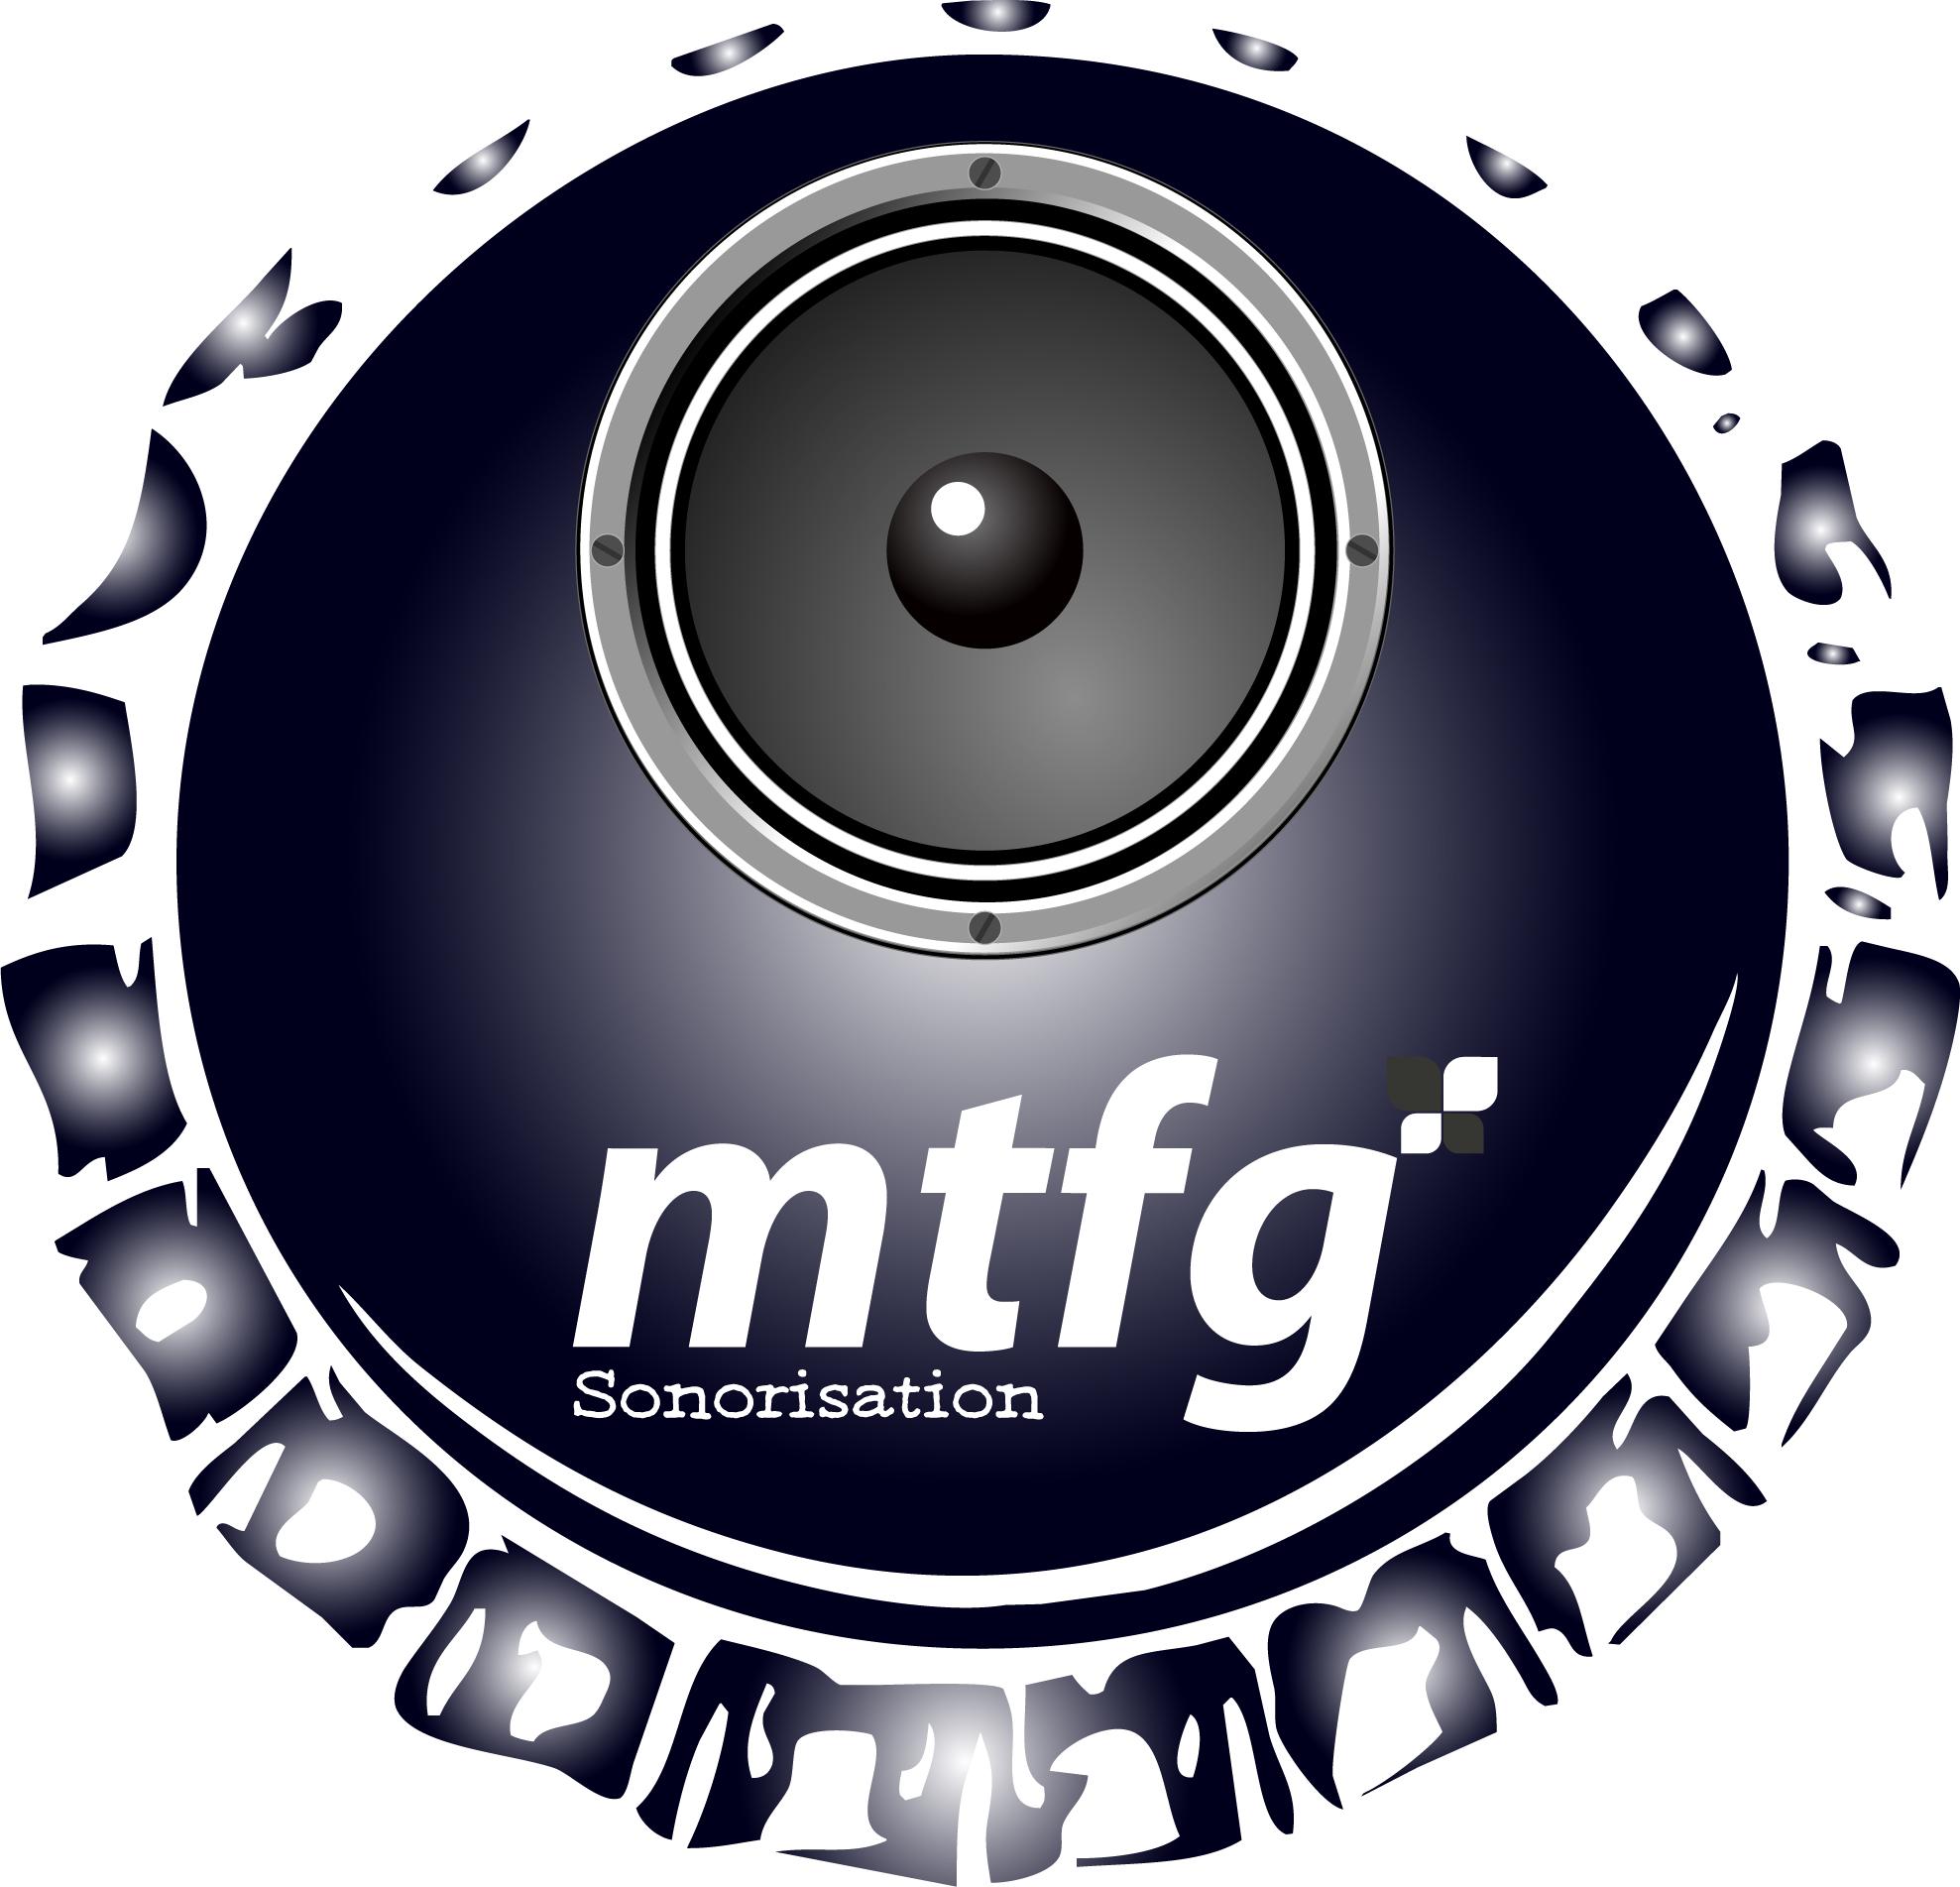 MTFG Sonorisation